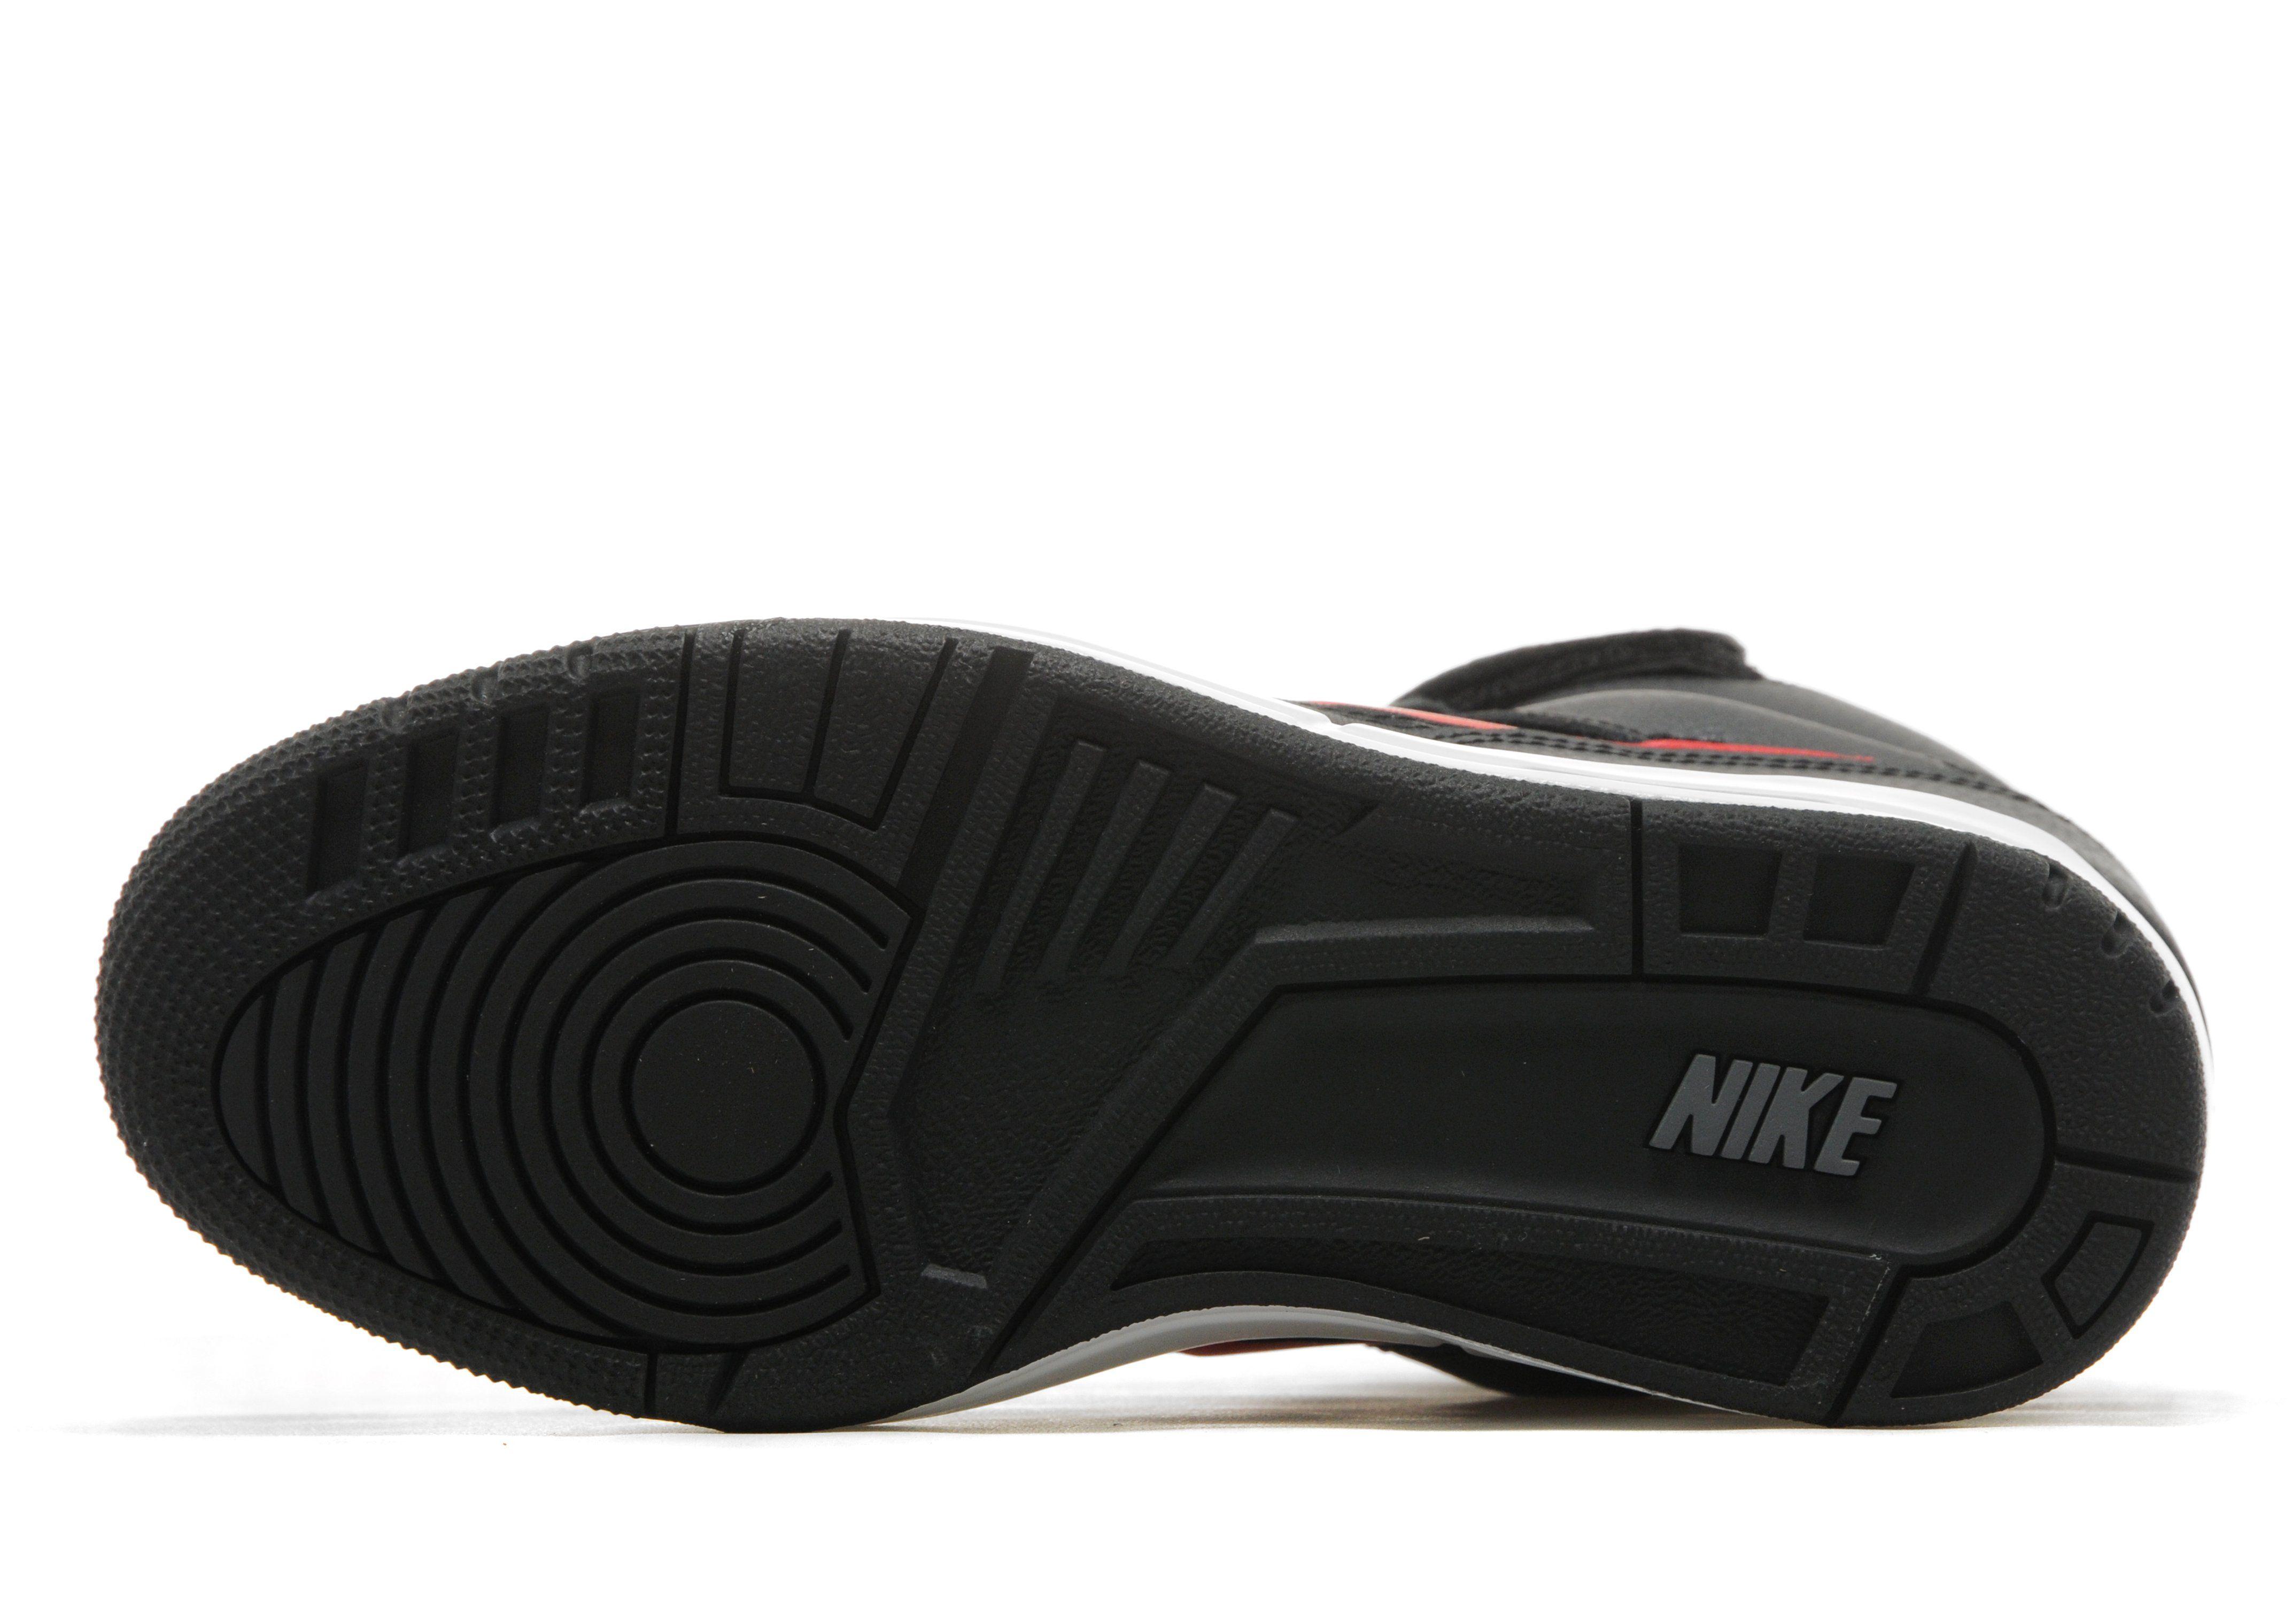 Nike Air Revolution Sky Hi Women's